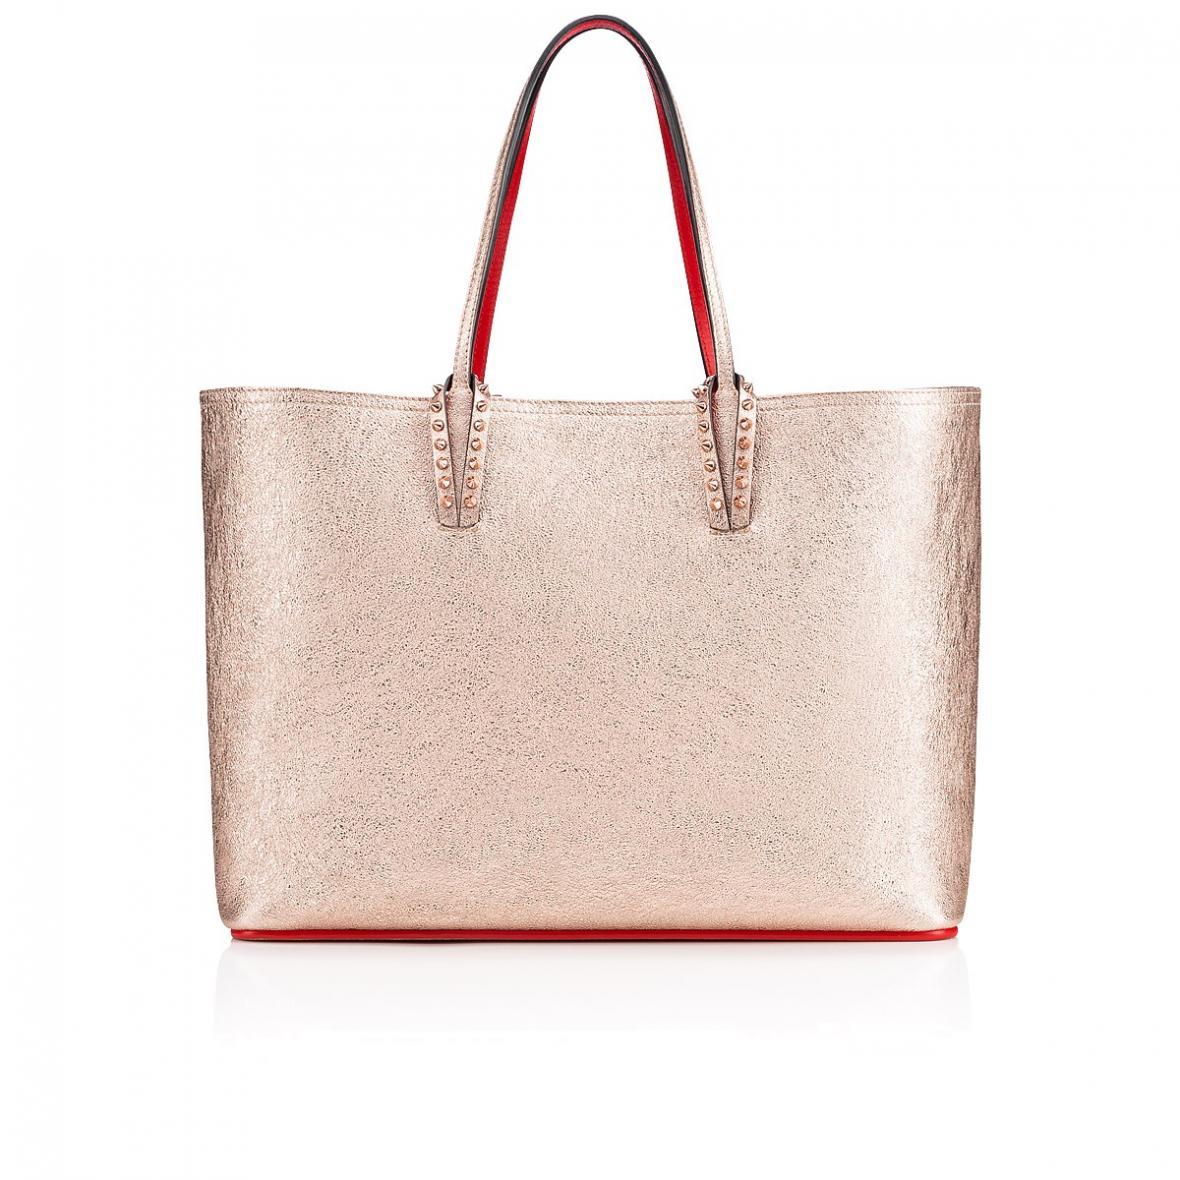 Christian Louboutin rose gold Cabata tote bag